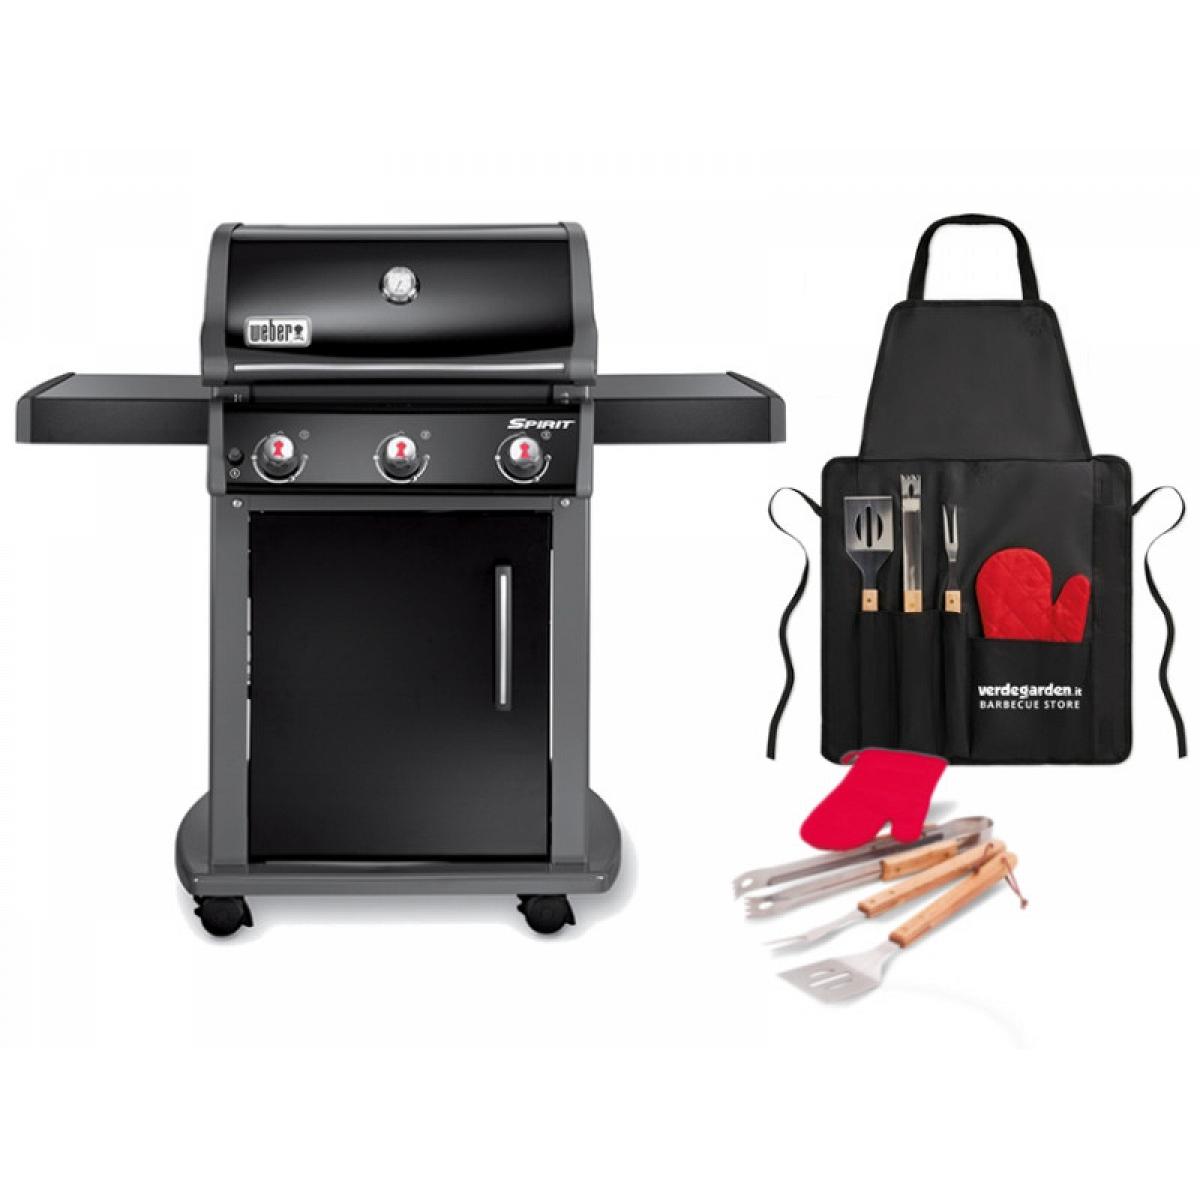 barbecue gas spirit e 310 weber with 3 burners. Black Bedroom Furniture Sets. Home Design Ideas